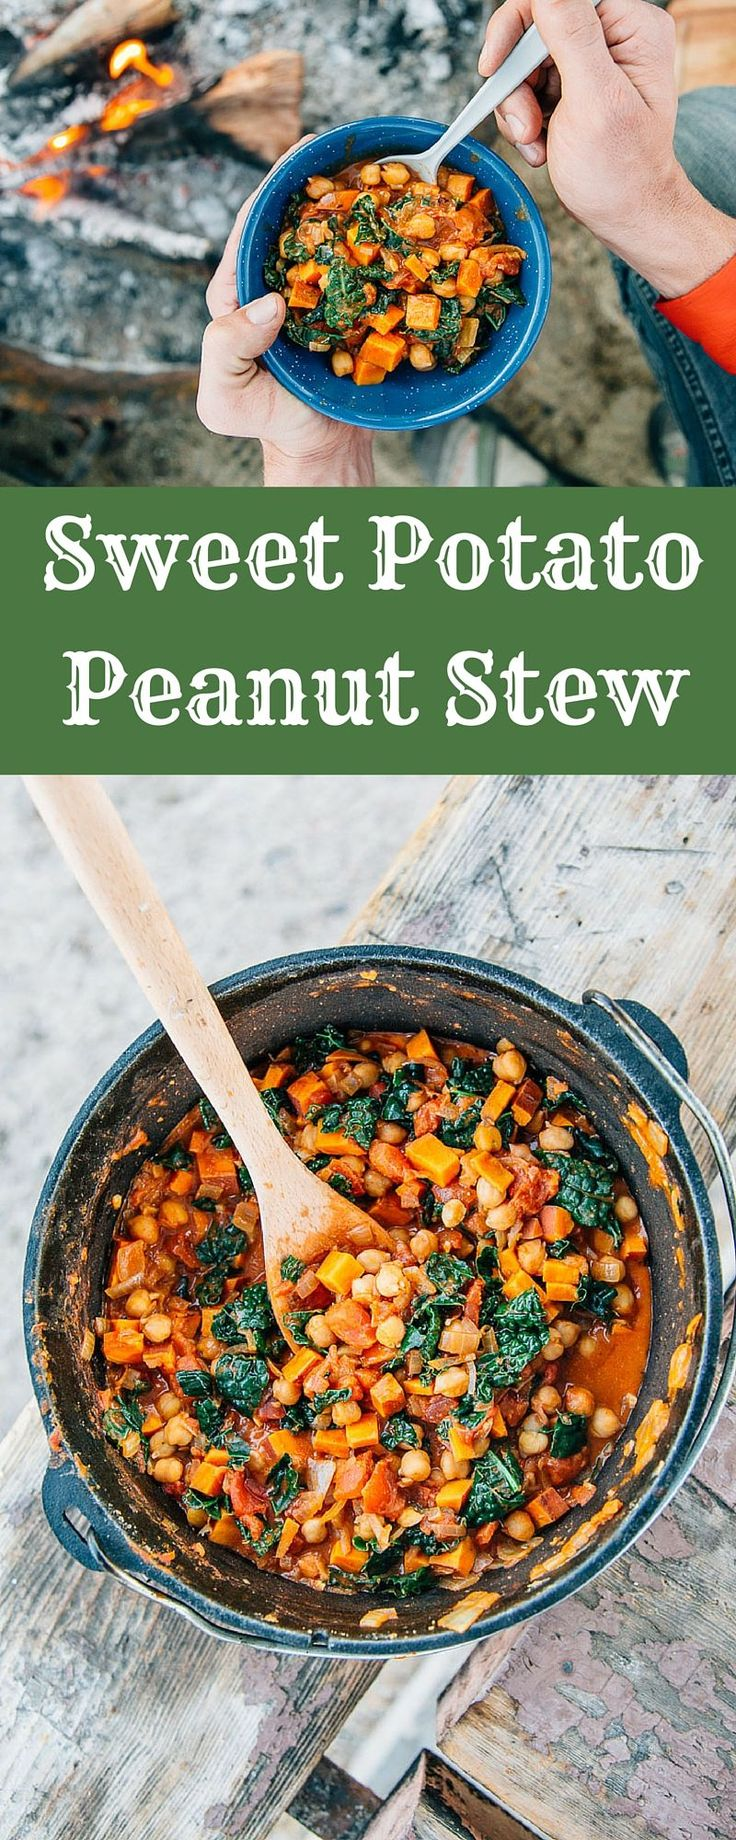 83 best vegan camping food images on pinterest camping foods african sweet potato and peanut stew backpacking mealscamping mealskayak campingvegan forumfinder Gallery